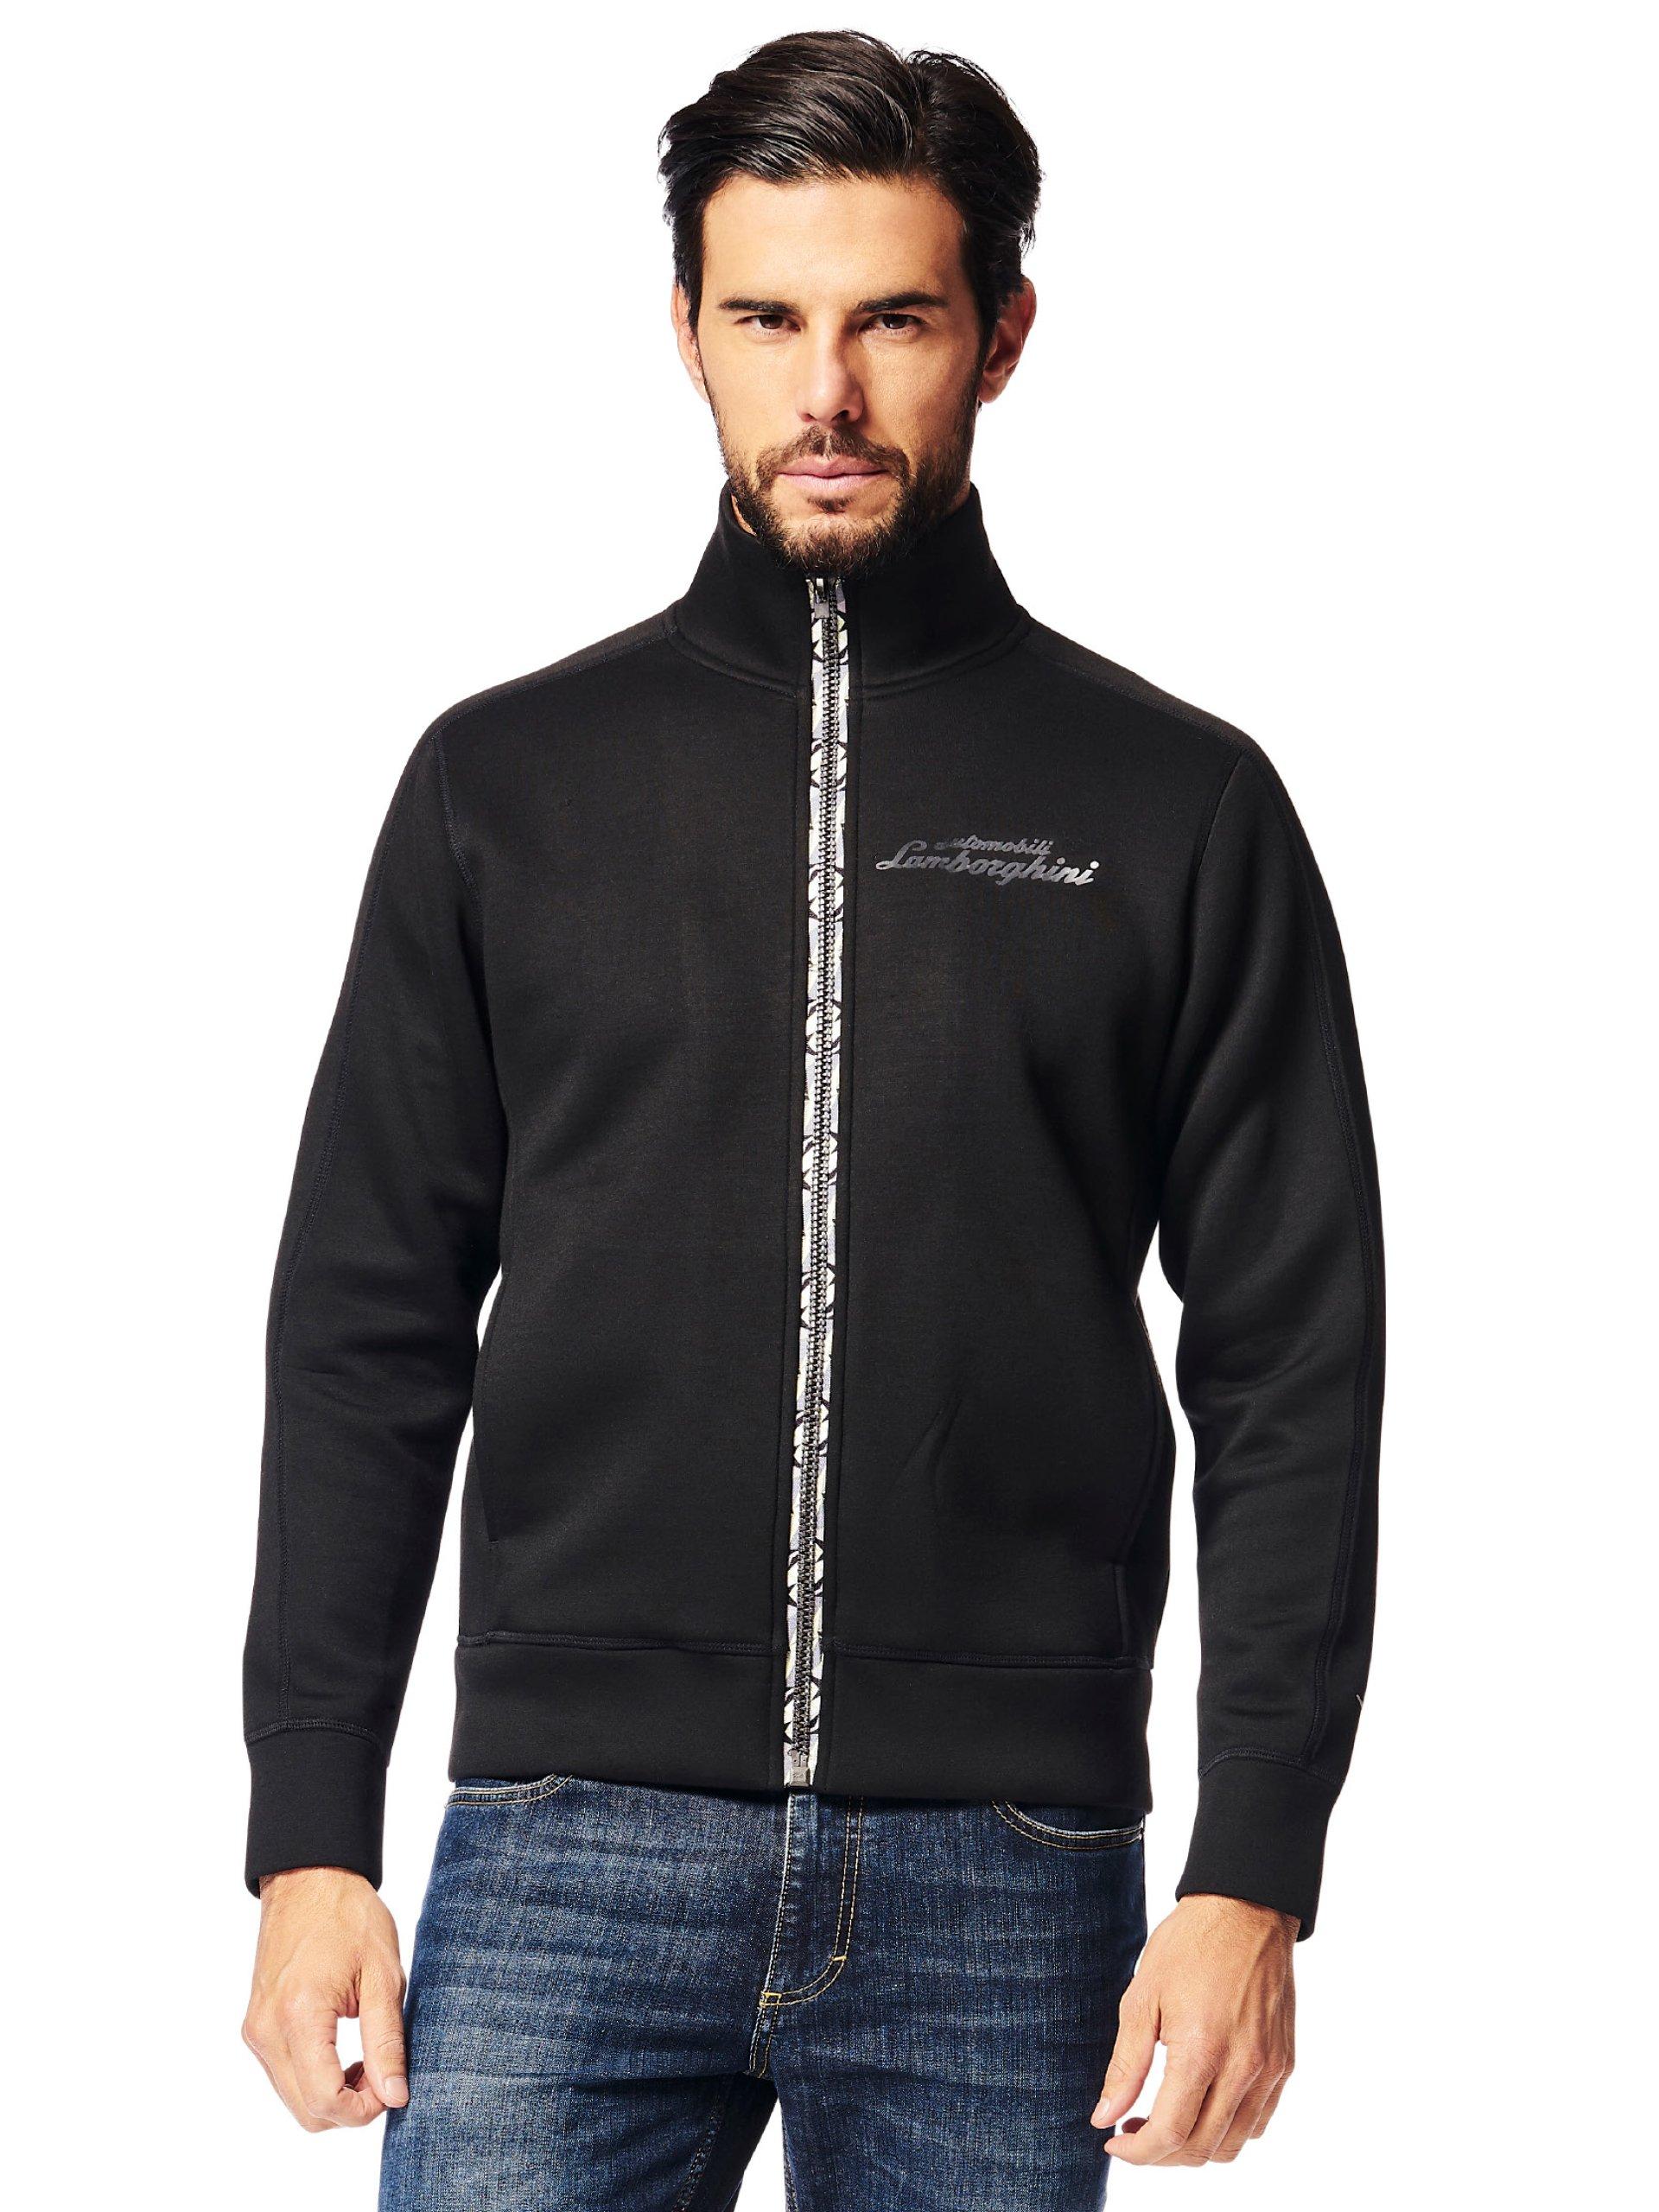 Automobili Lamborghini Men's Pilota Ufficiale Zip-up Sweatshirt 9099 S Black